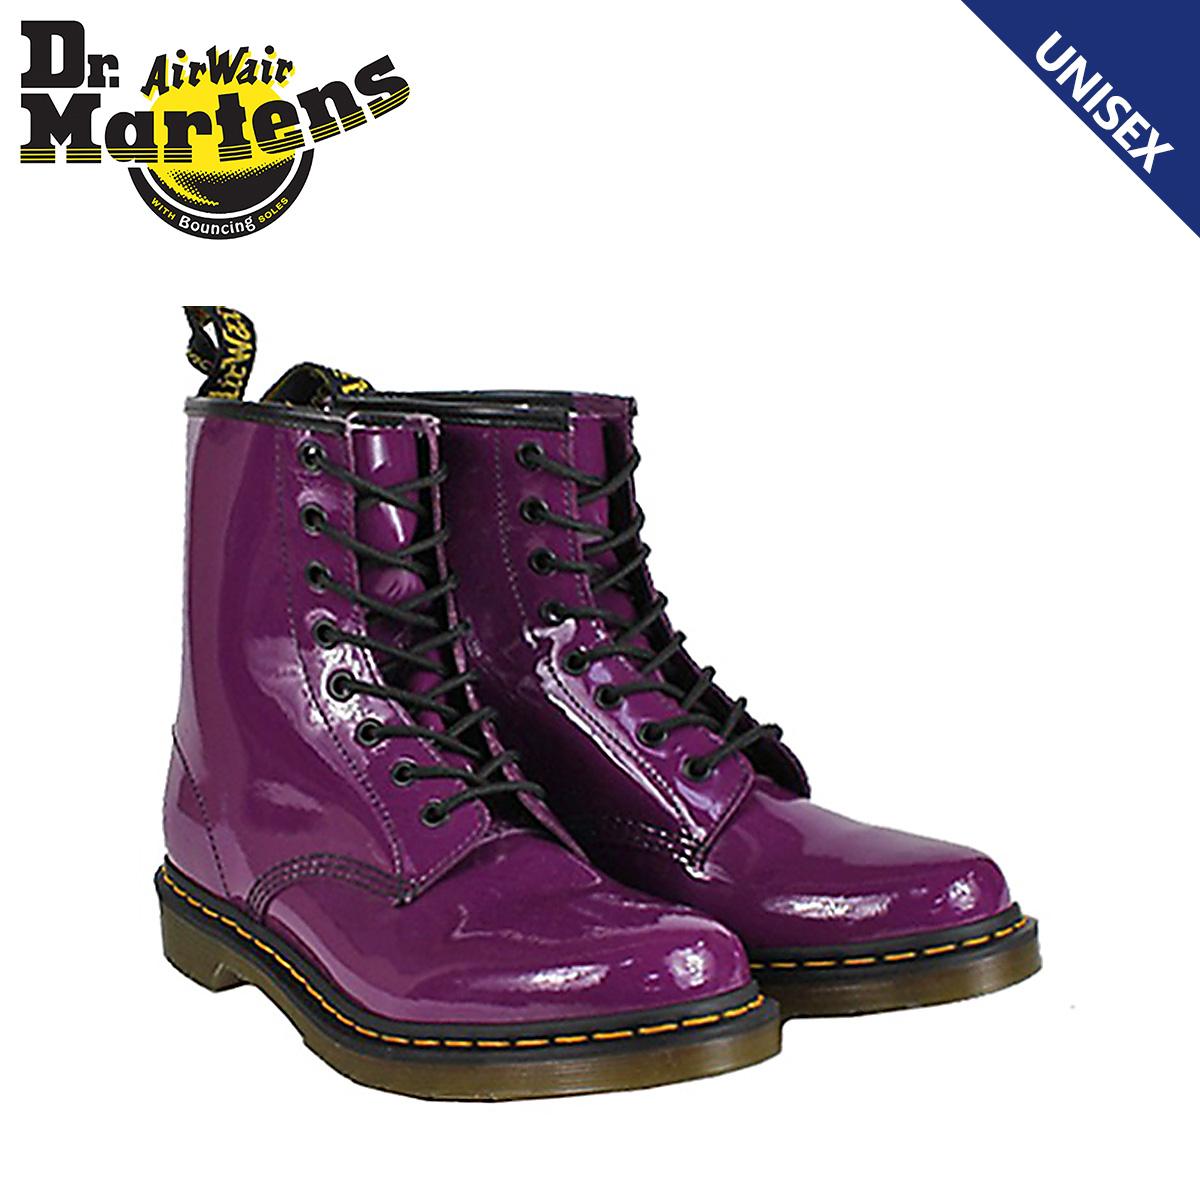 Dr Martens ドクターマーチン 1460 8ホール ブーツ レディース WOMENS 8 EYE BOOT R11821512 メンズ534jAcRLSq